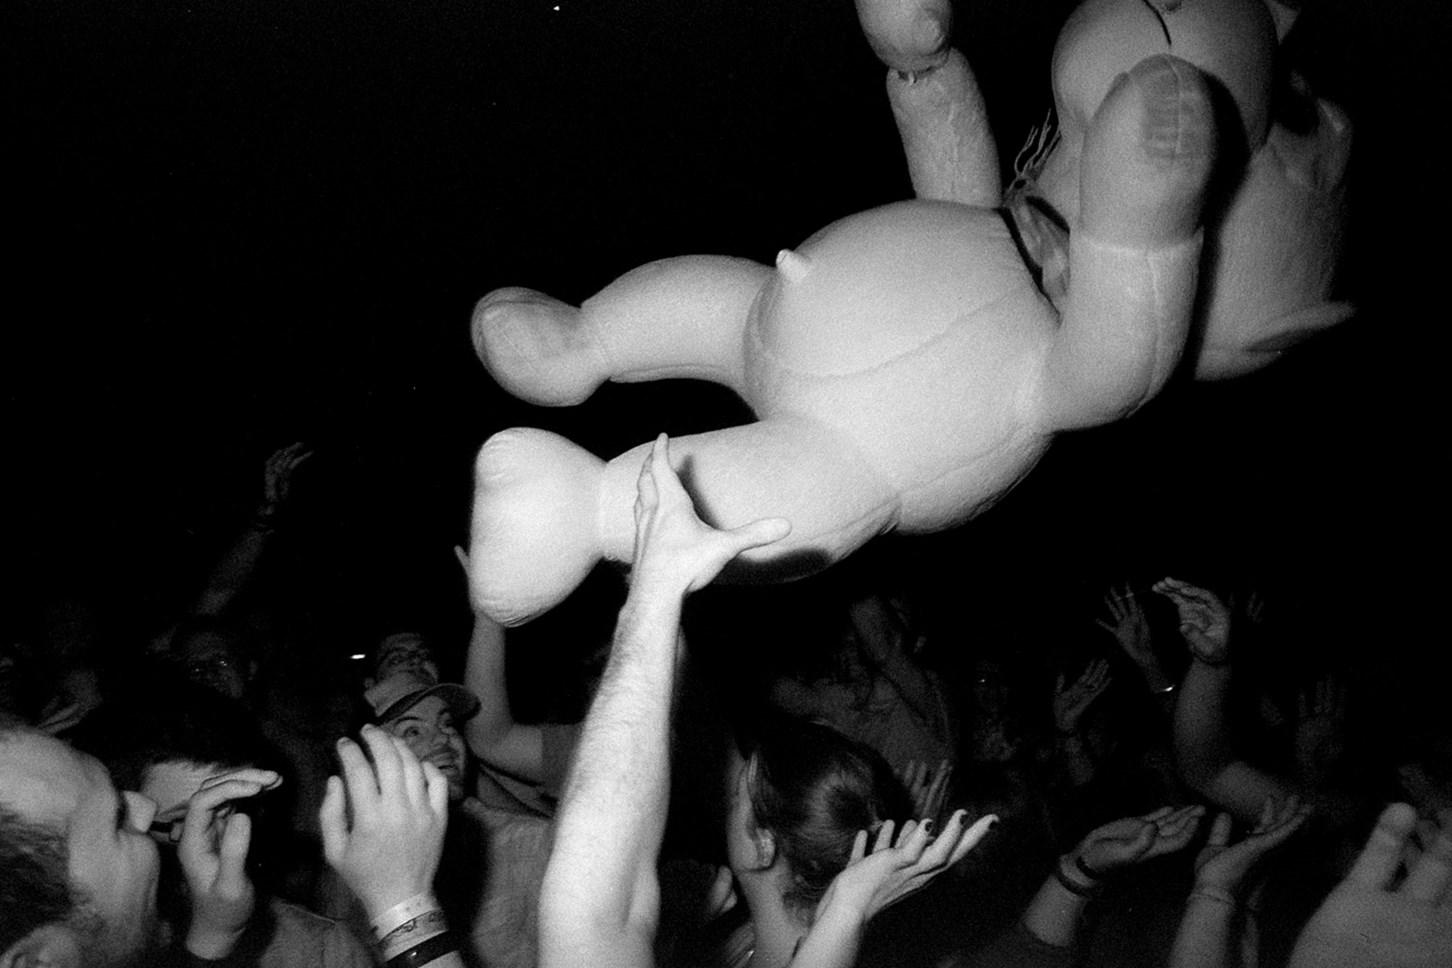 Stuffed Monkey Surfs [Living], May 2013